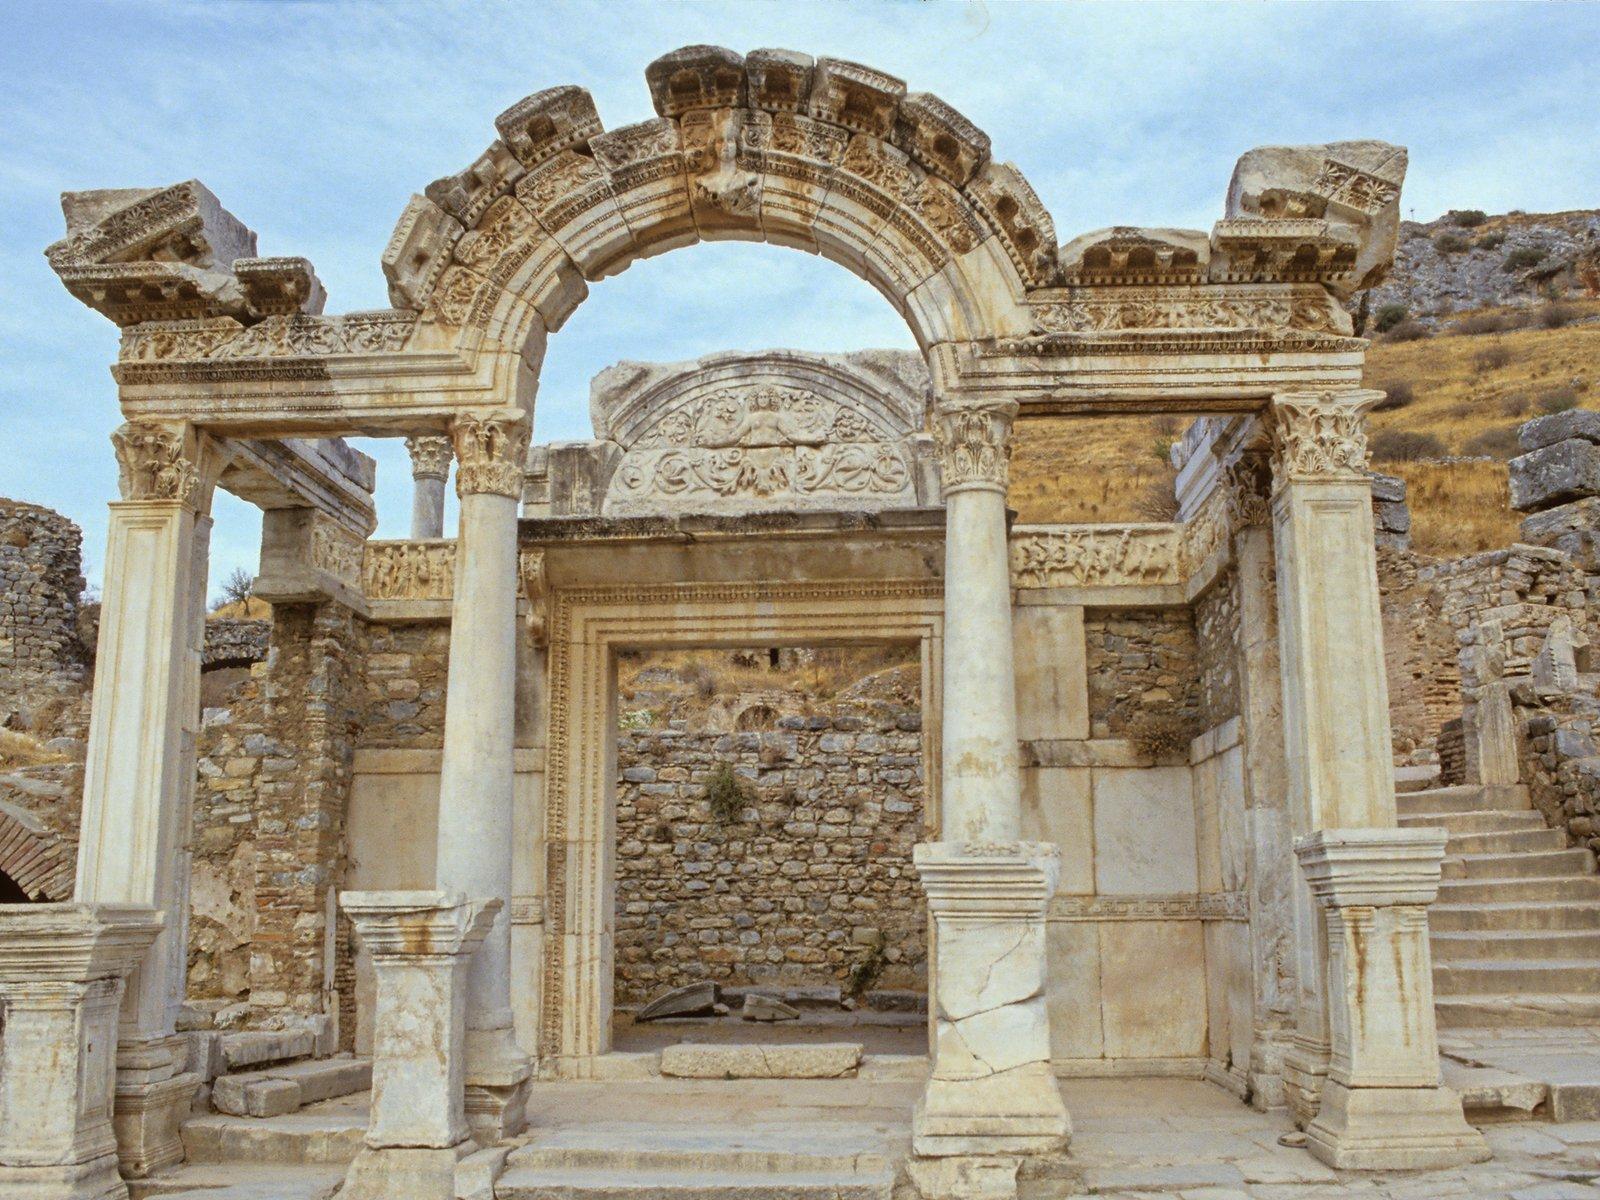 Fall Coffee Wallpaper Samsung 4 Free Greek Roman Ruins Stock Photo Freeimages Com